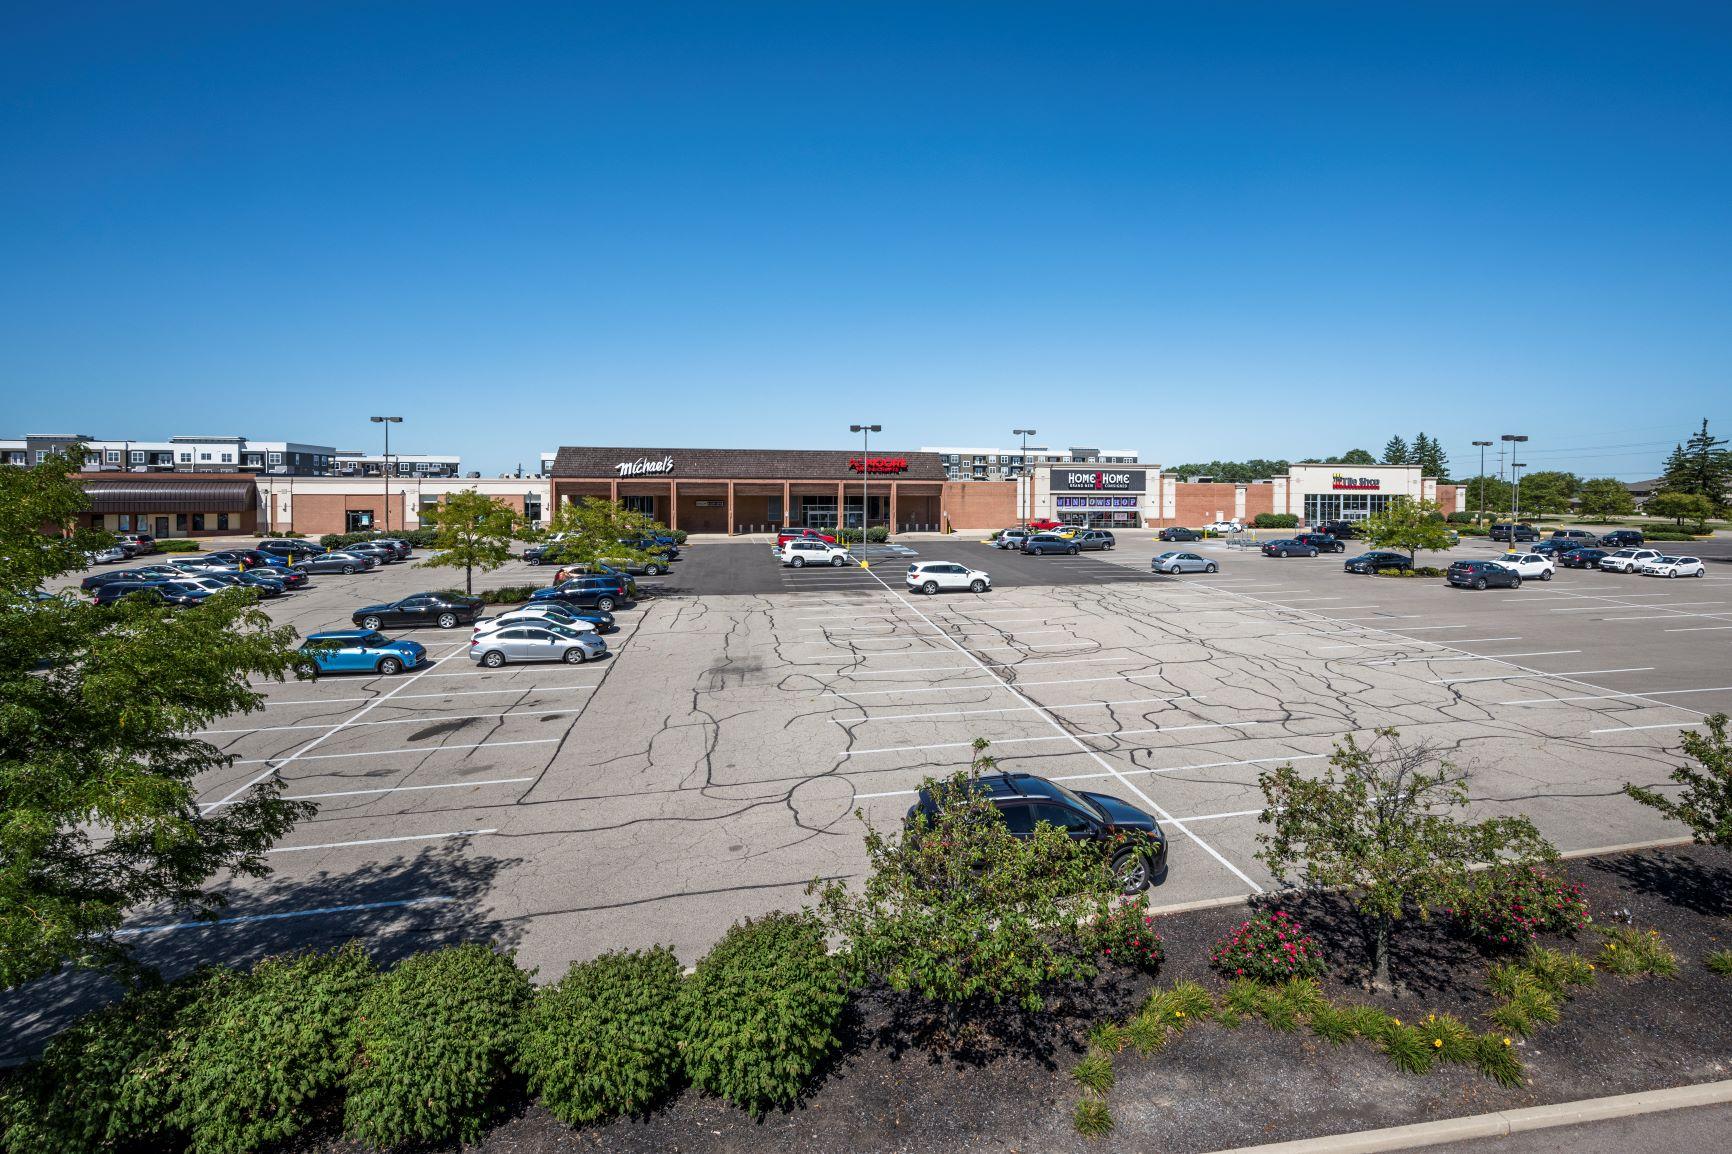 Cross Pointe Shopping Center